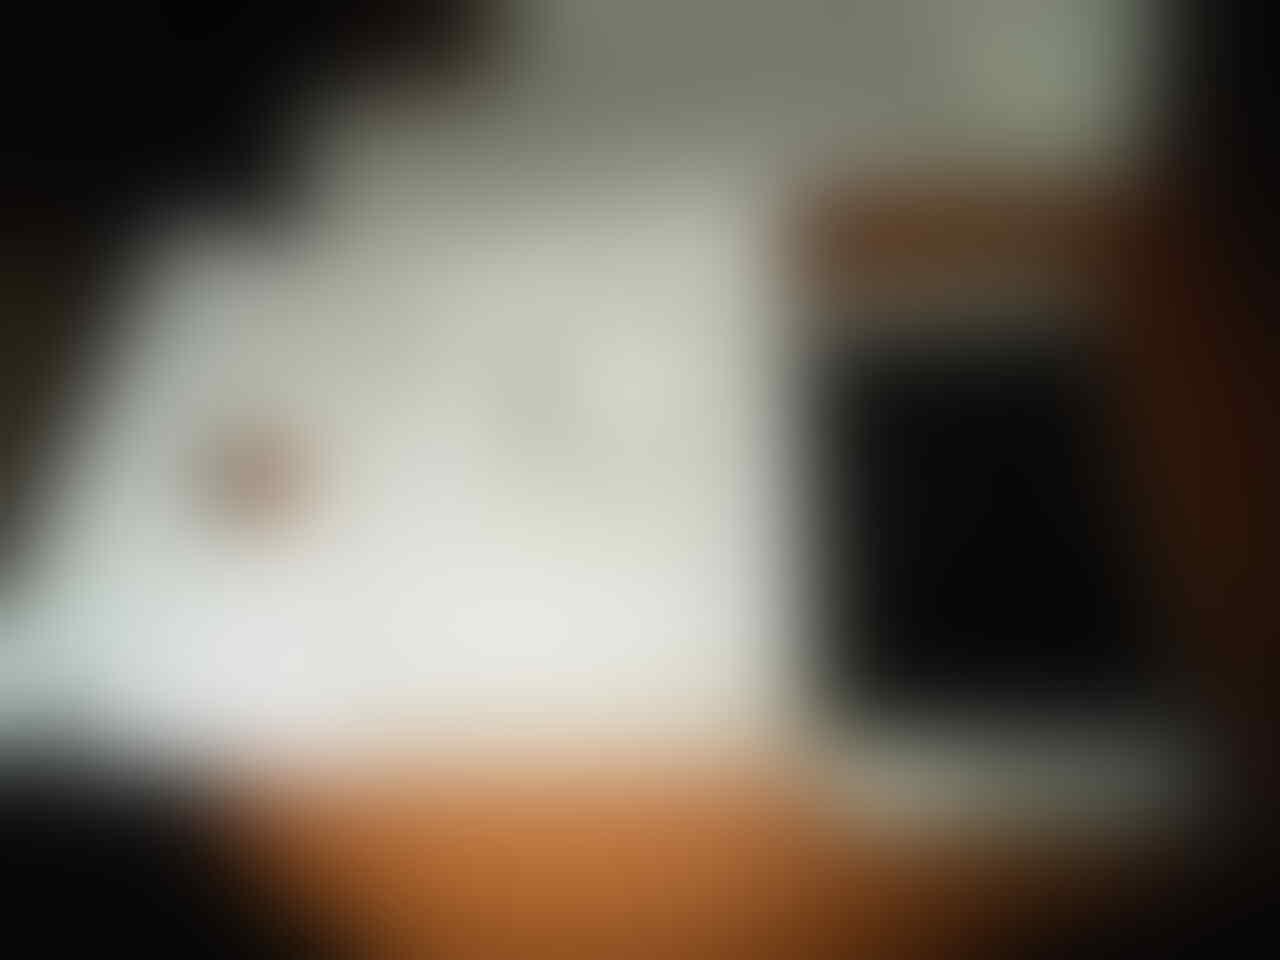 Iphone 6 plus 16GB FU MURMER !!! MULUS LIKE NEW NO DENT !!!